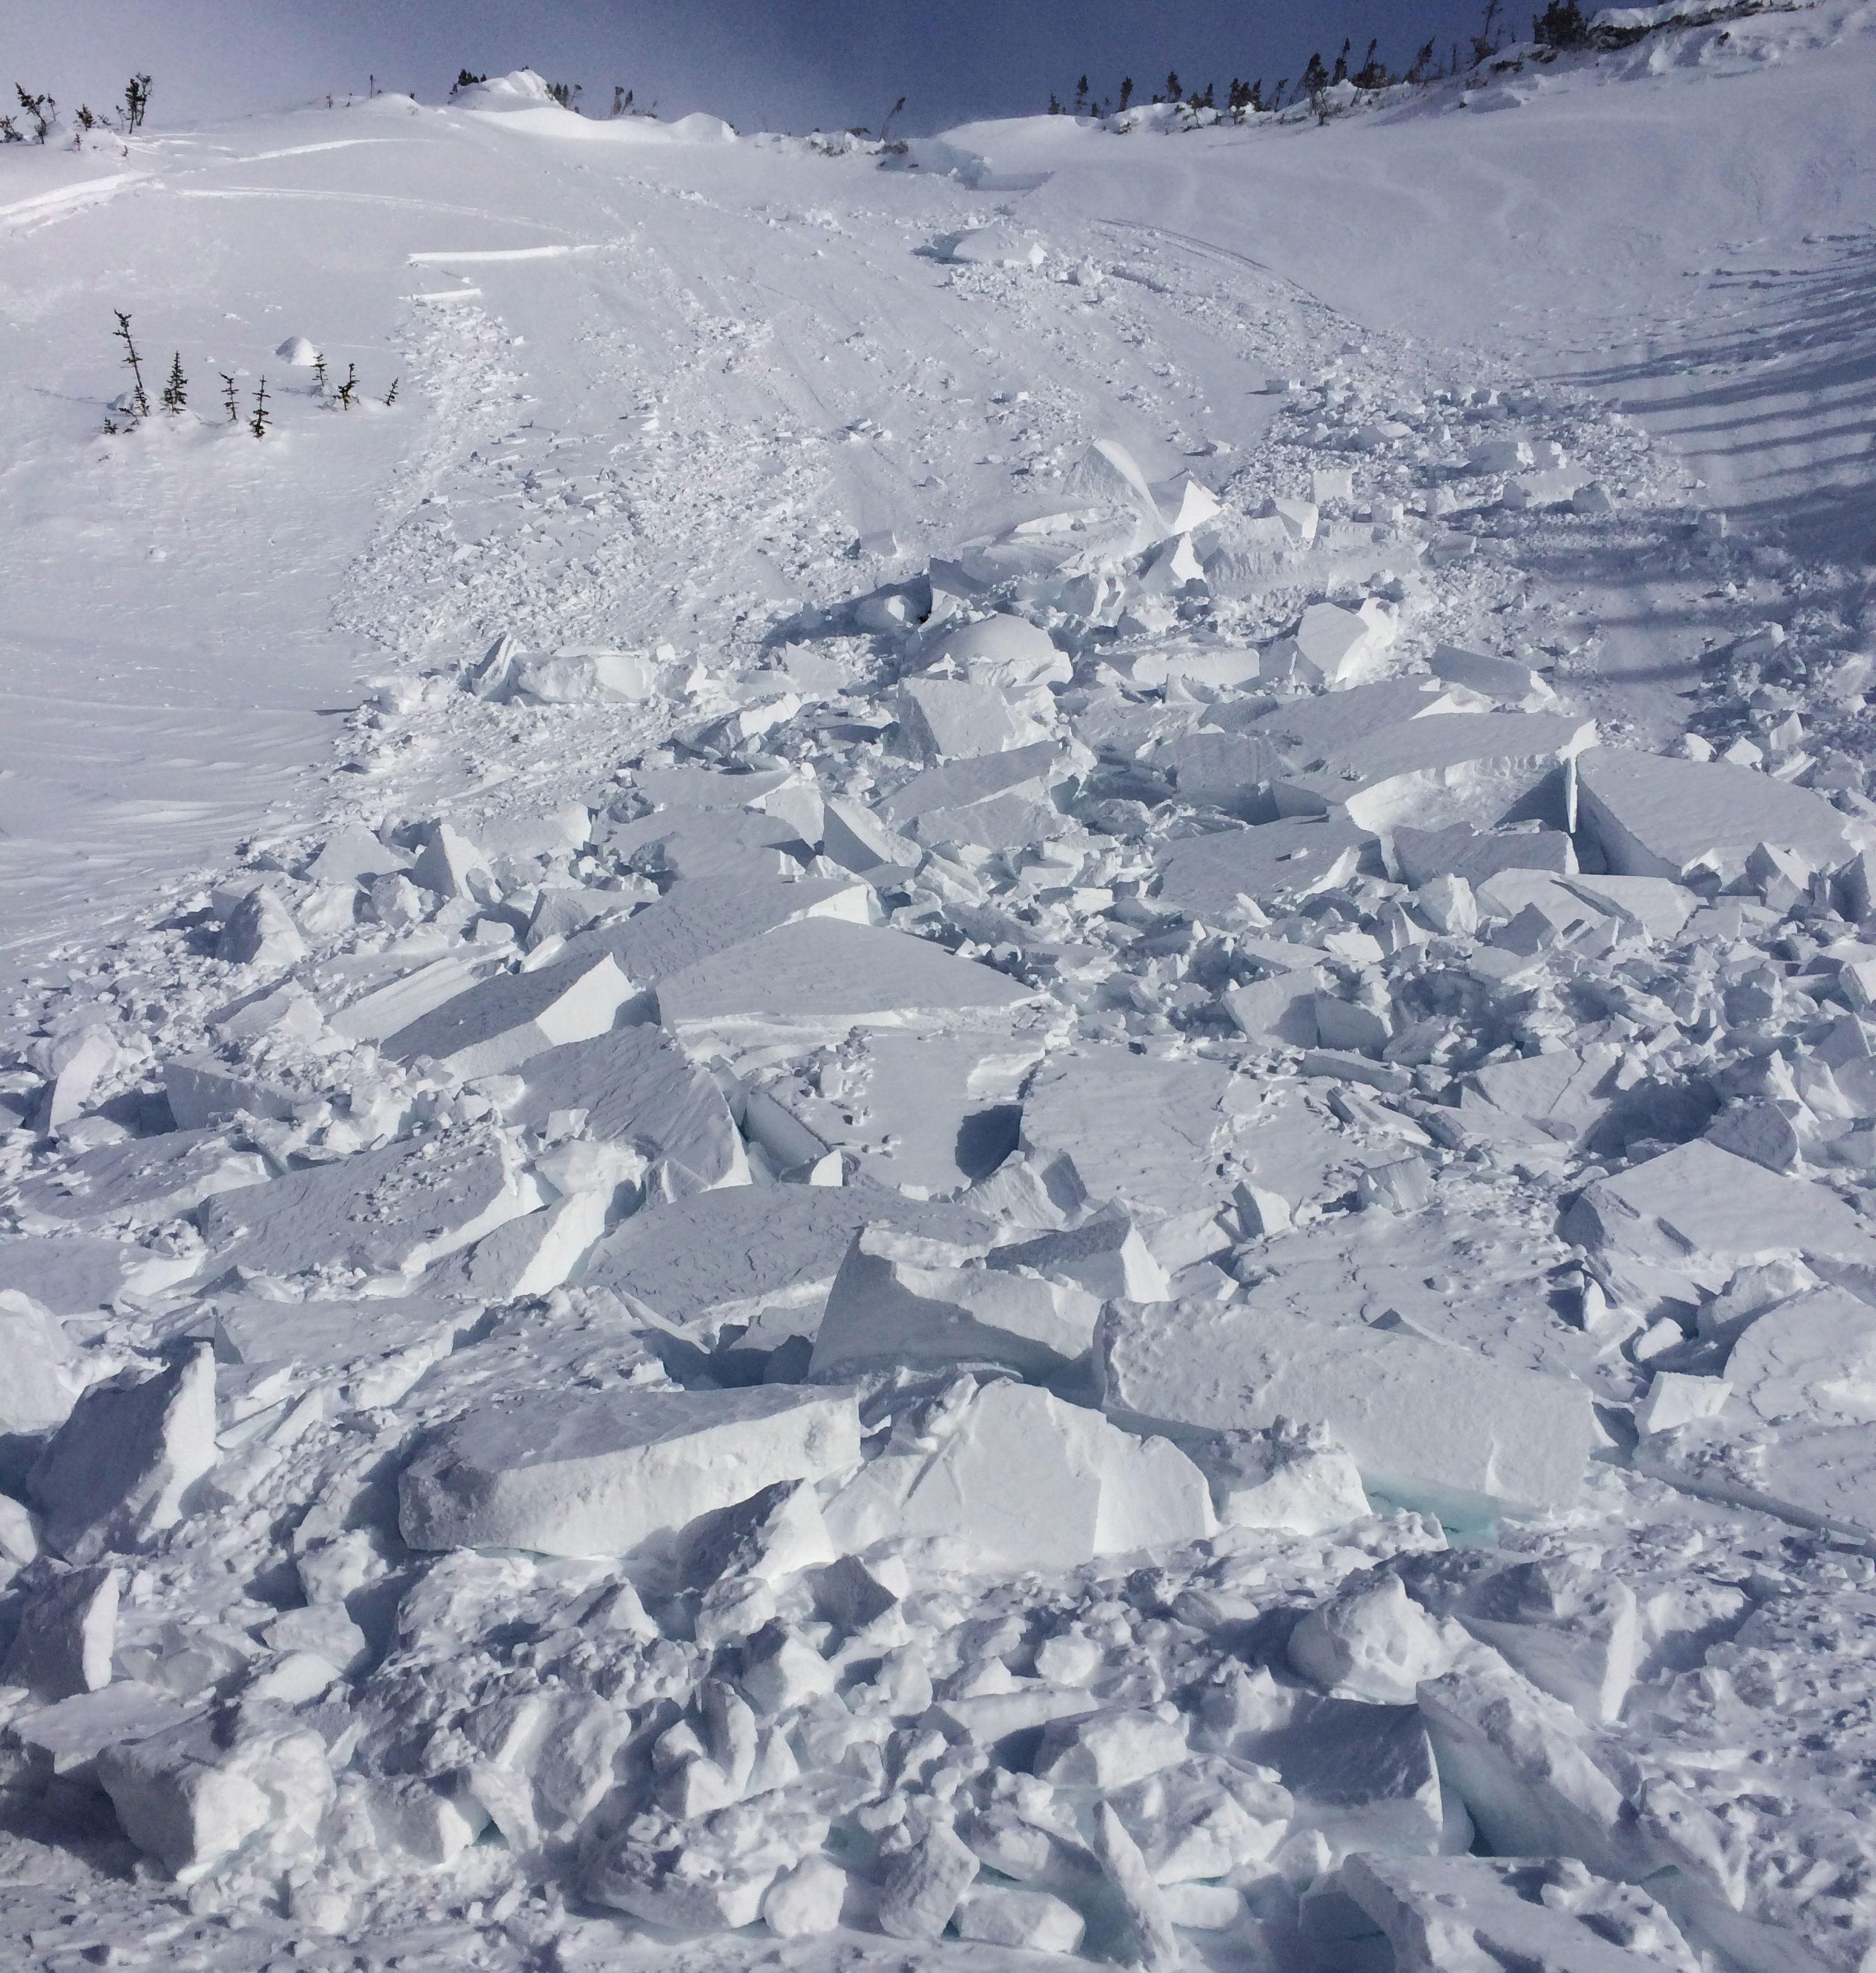 A slab avalanche.